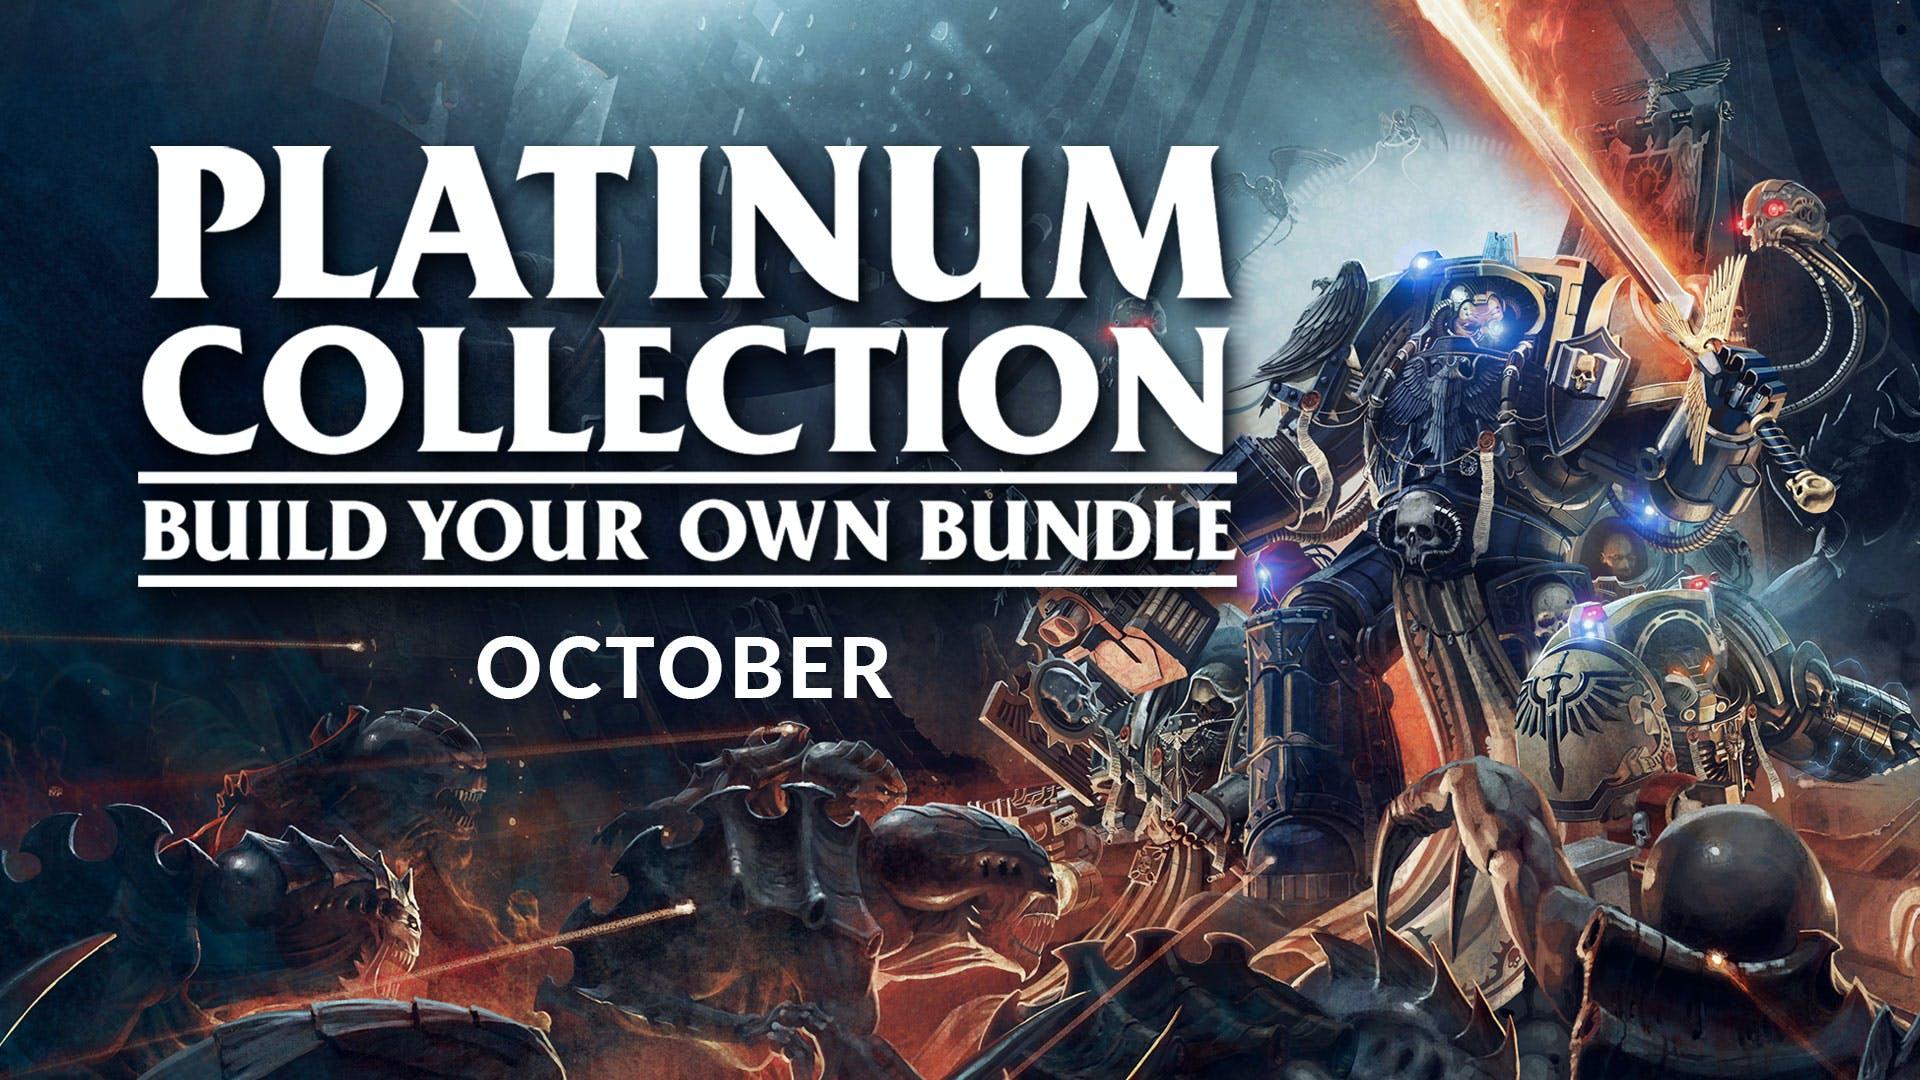 Platinum Collection - Build your own Bundle (October)